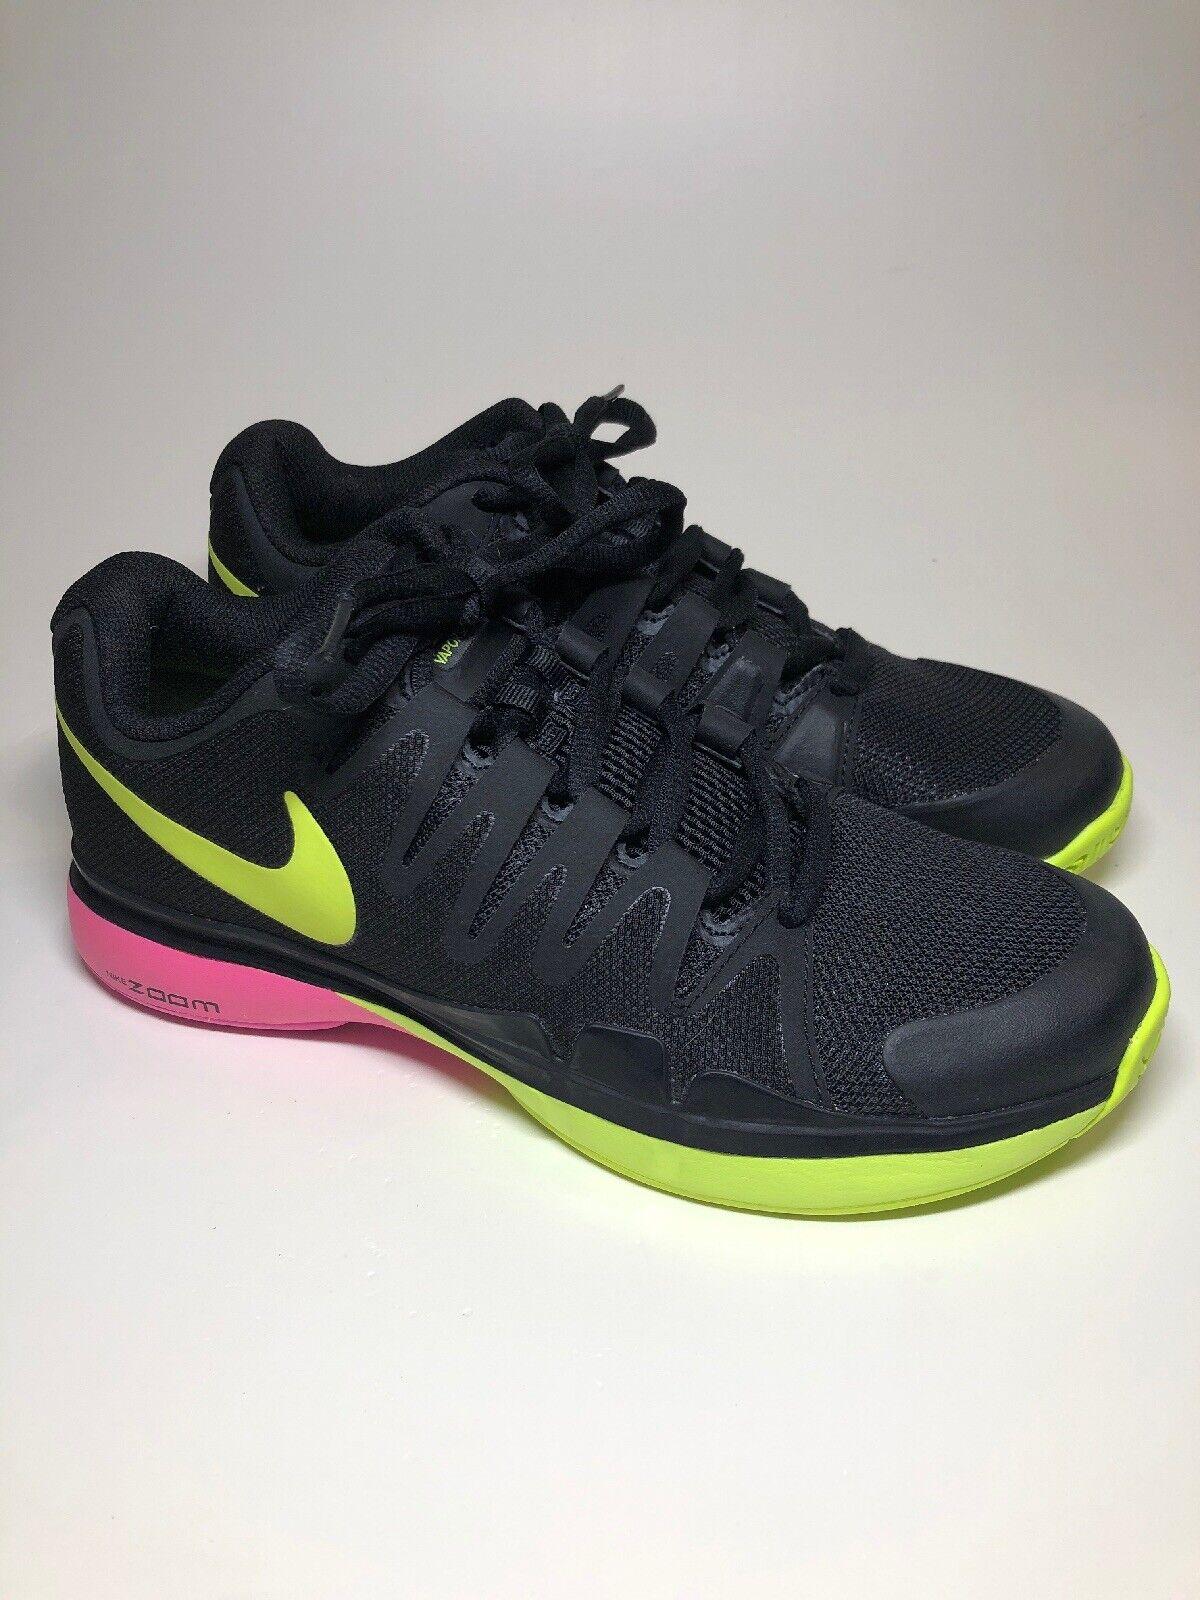 Nike Vapor 9.5 Tour Black Yellow Pink Tennis shoes Womens Size 8.5 M (Mens 7 M)